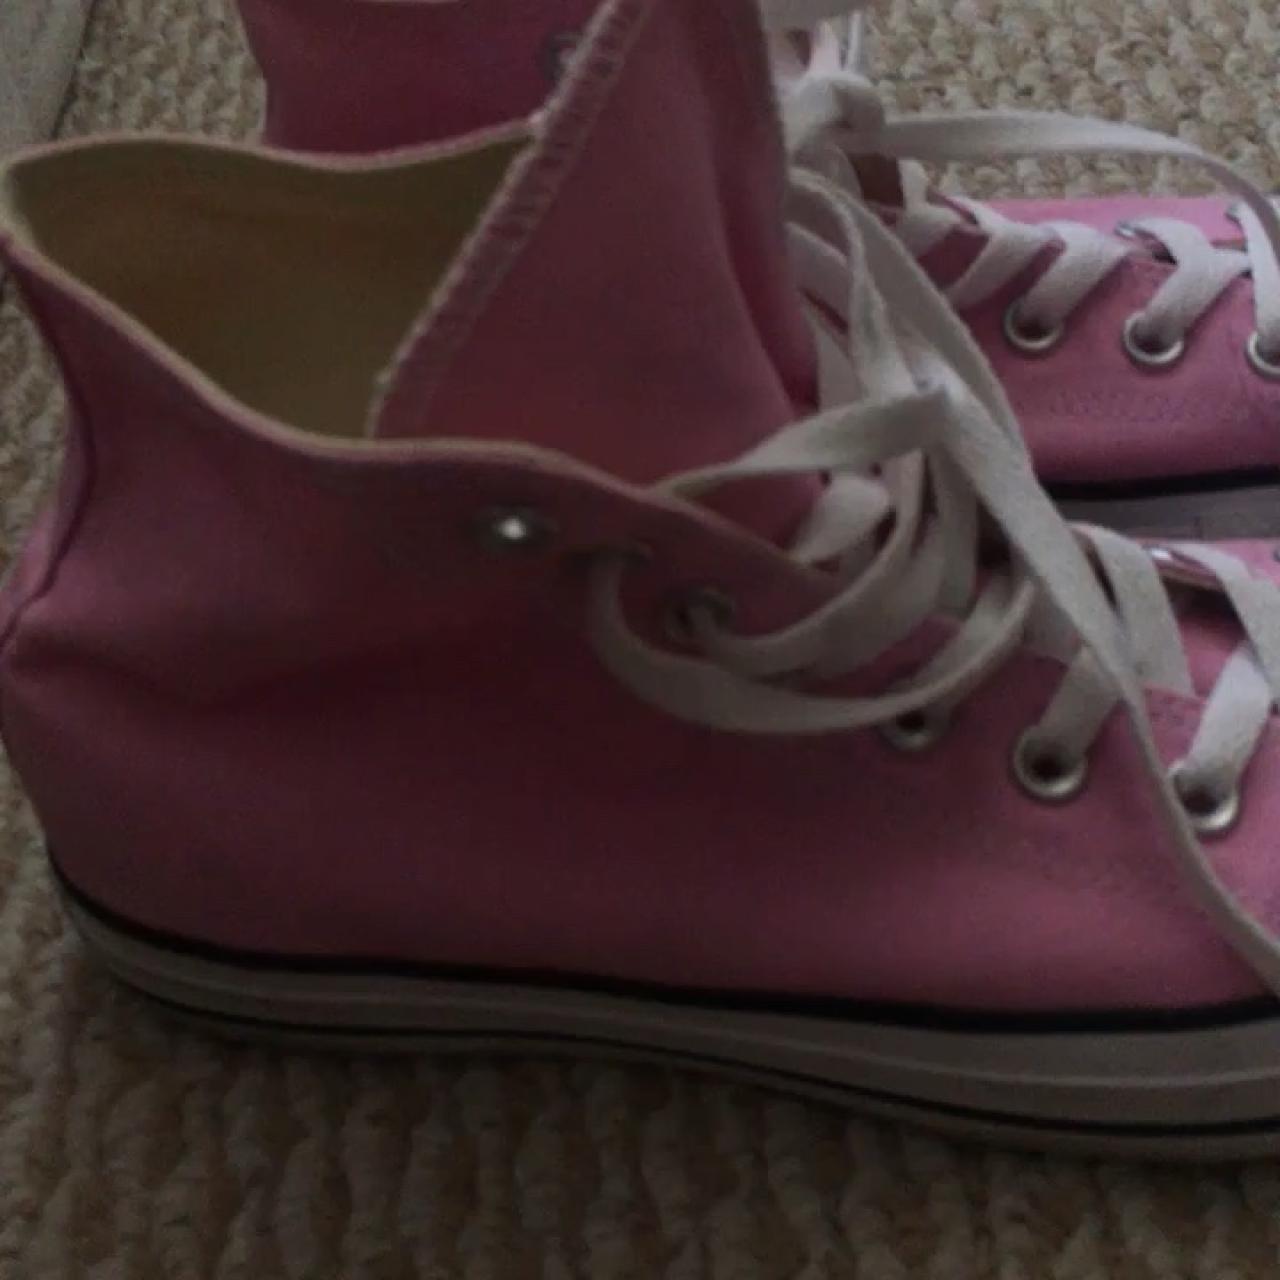 b198ffaa1565 Baby pink high top converse